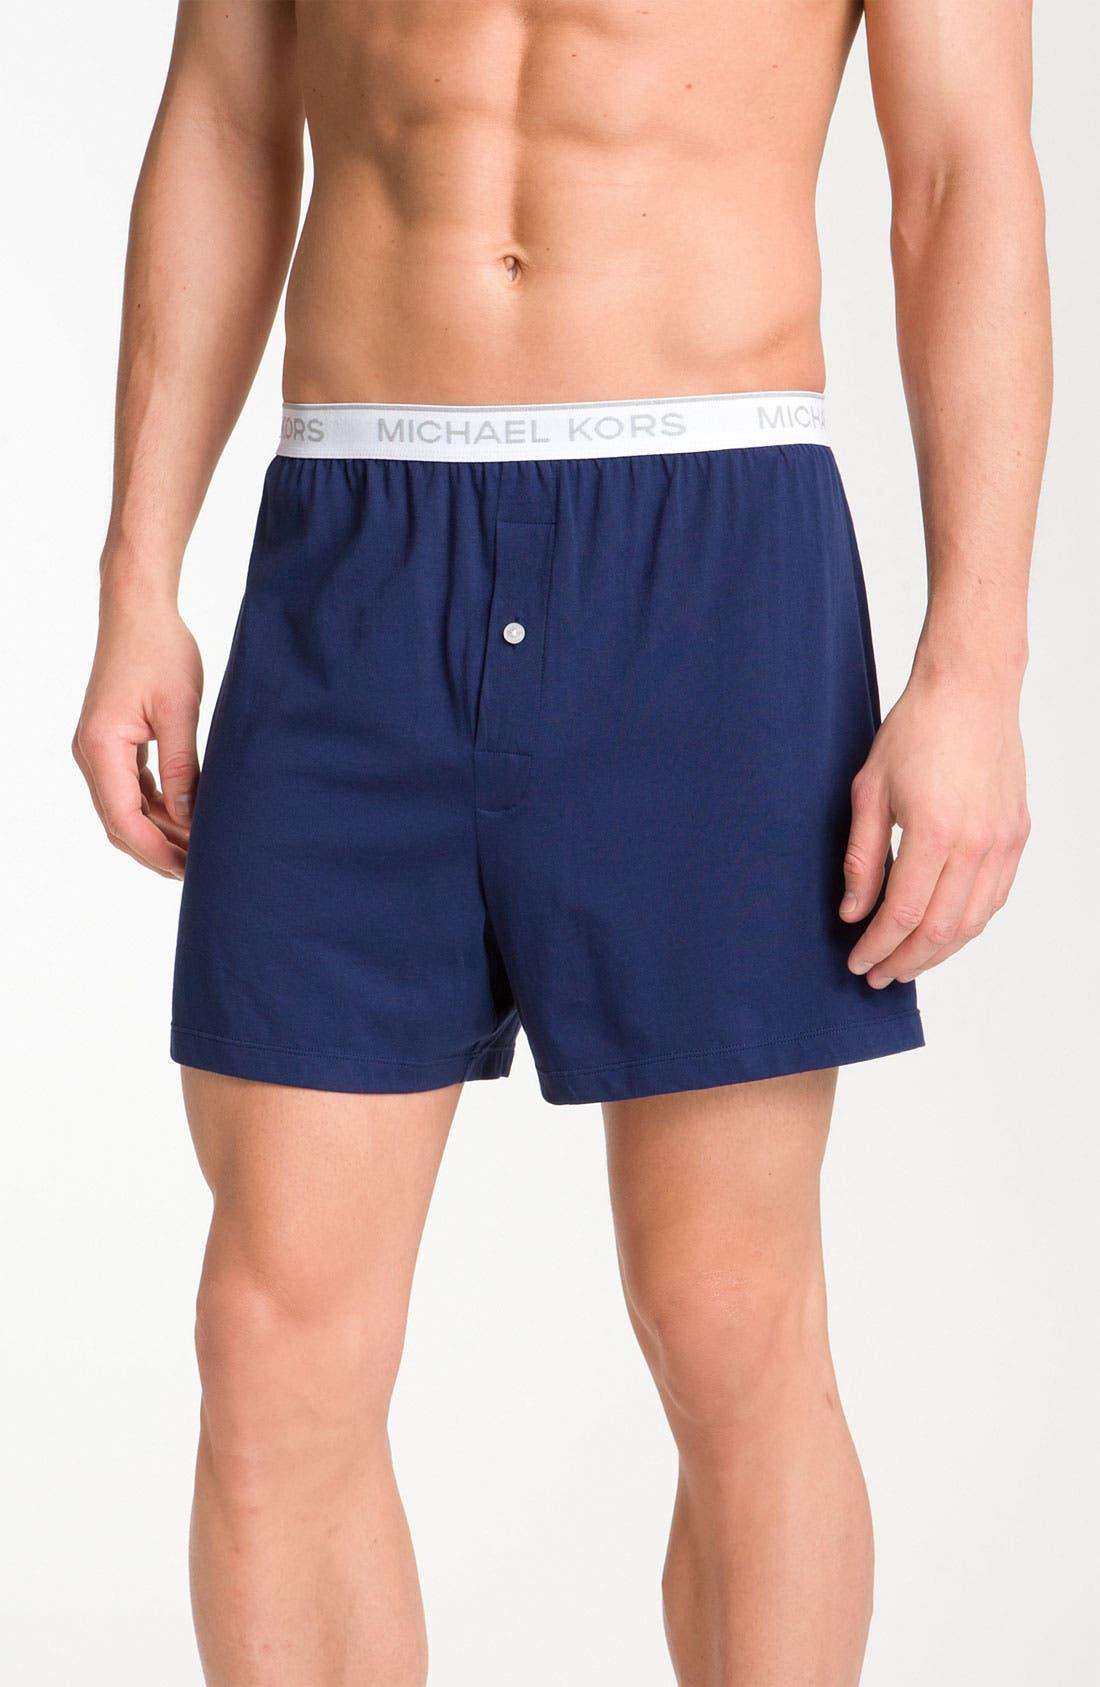 Main Image - Michael Kors Knit Boxers (2-Pack)